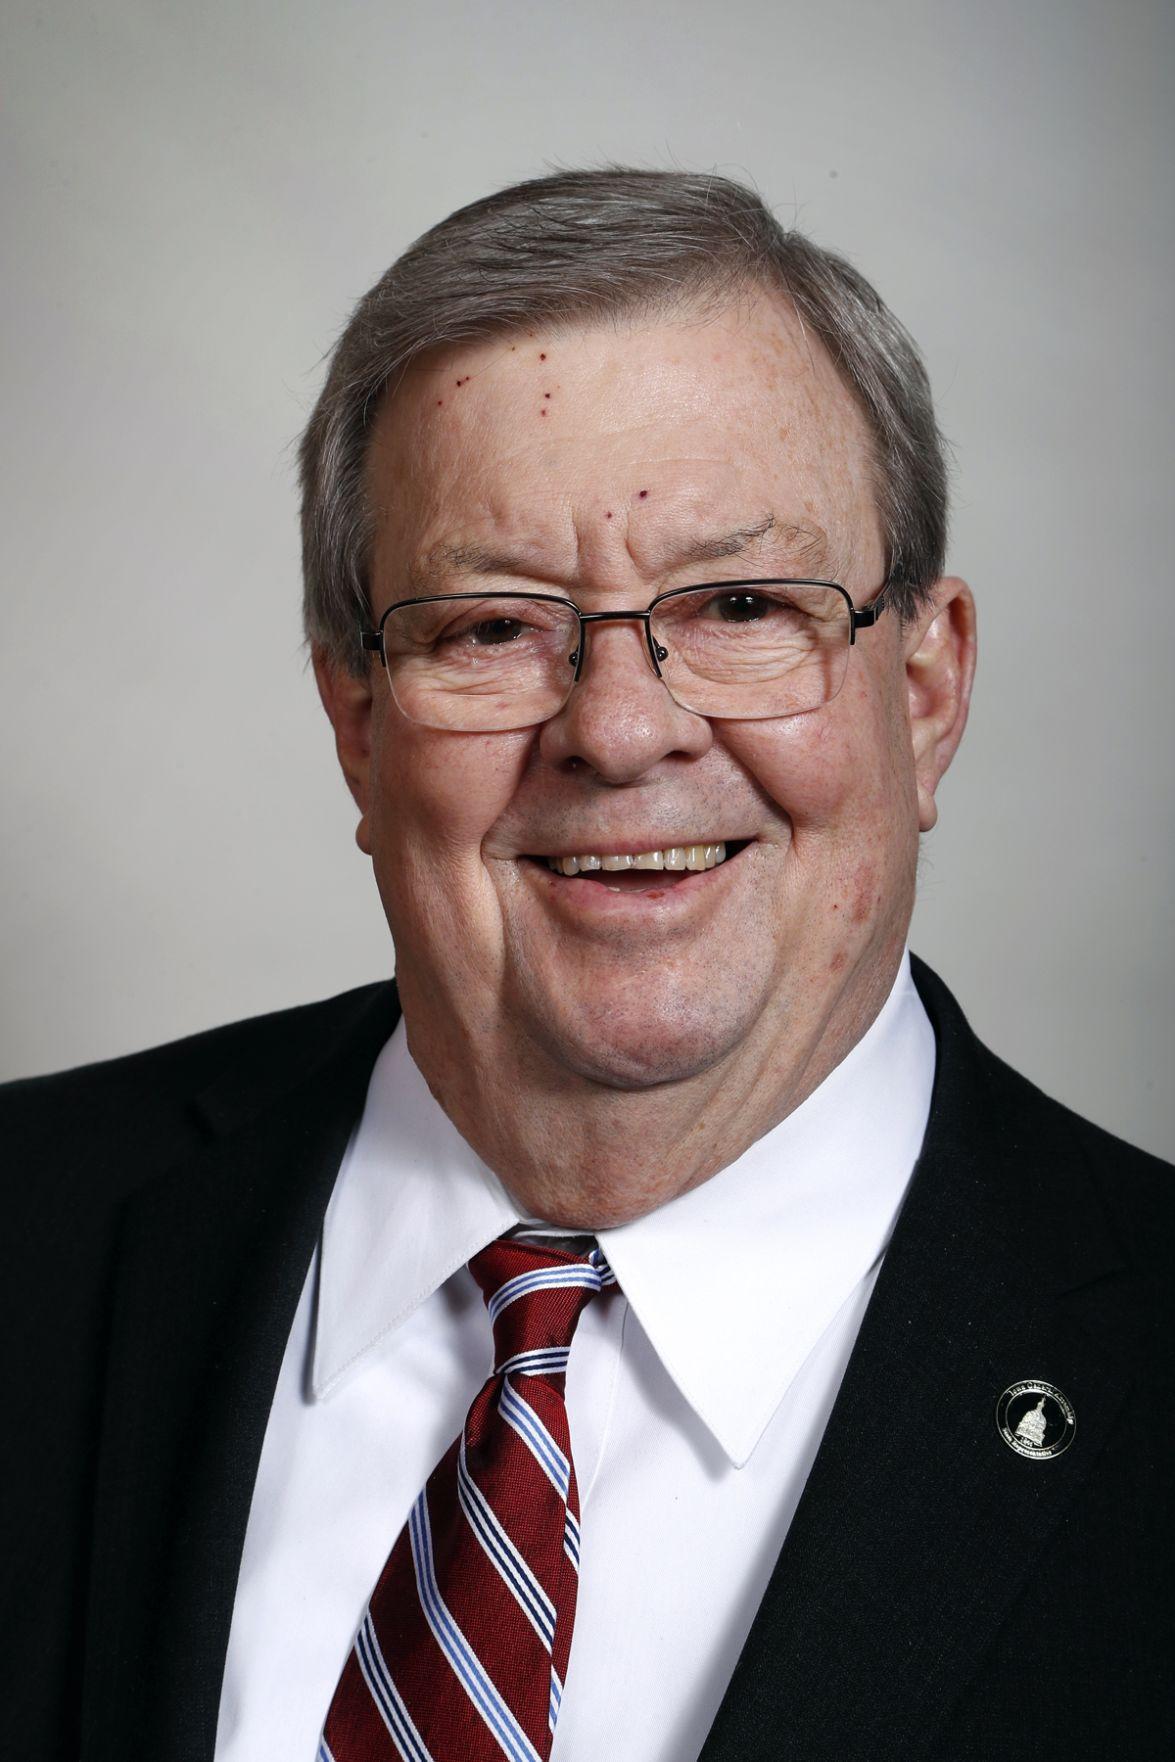 Iowa state Rep. Dave Heaton